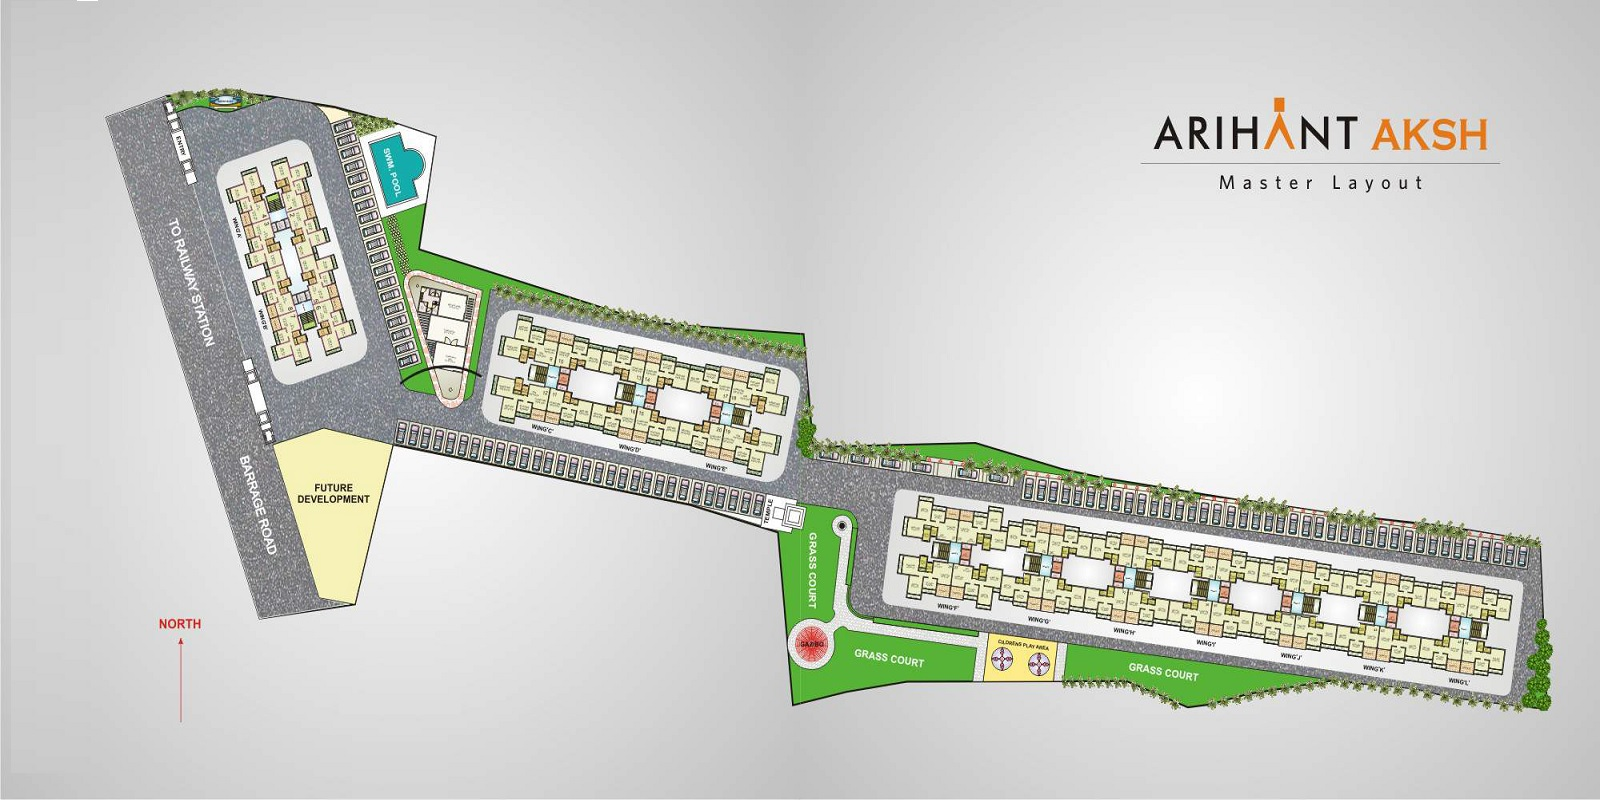 arihant aksh project master plan image1